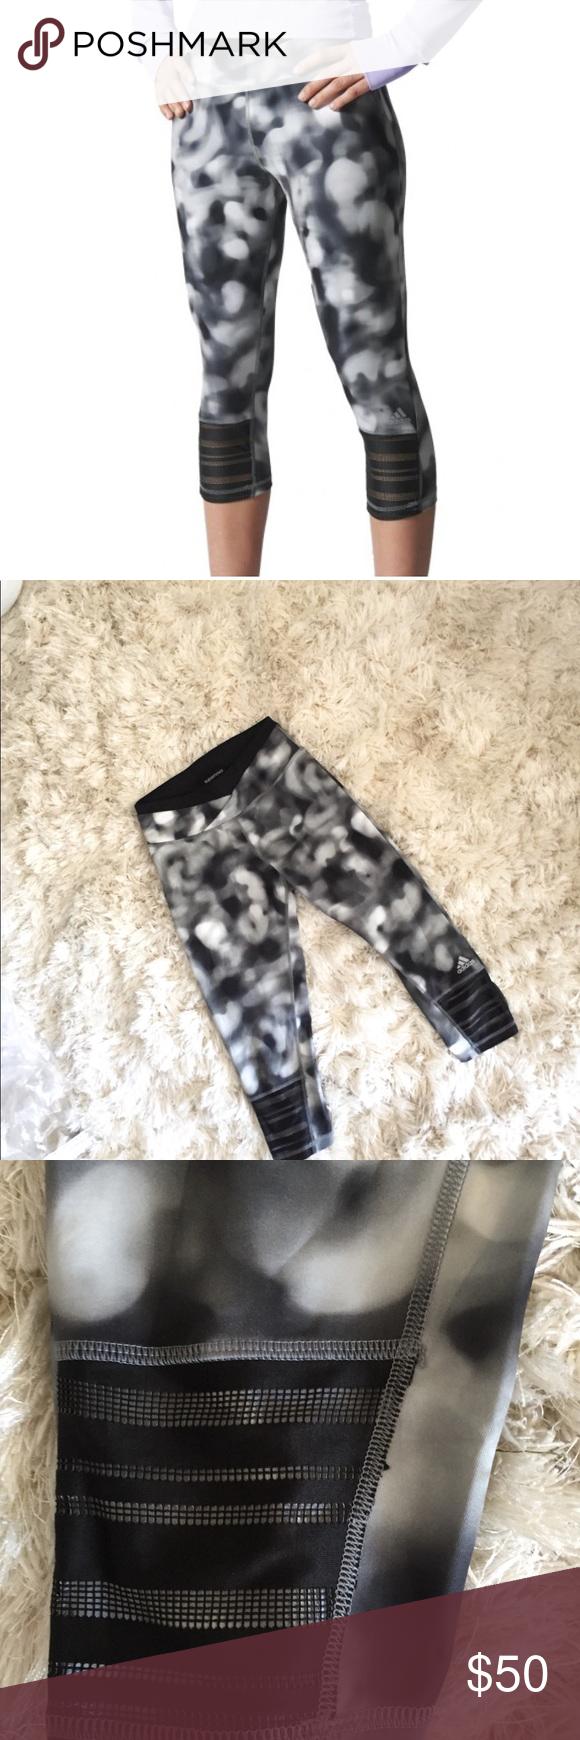 e12e2451e13e Adidas Supernova Workout Leggings Capri Pants Great condition! Black ...